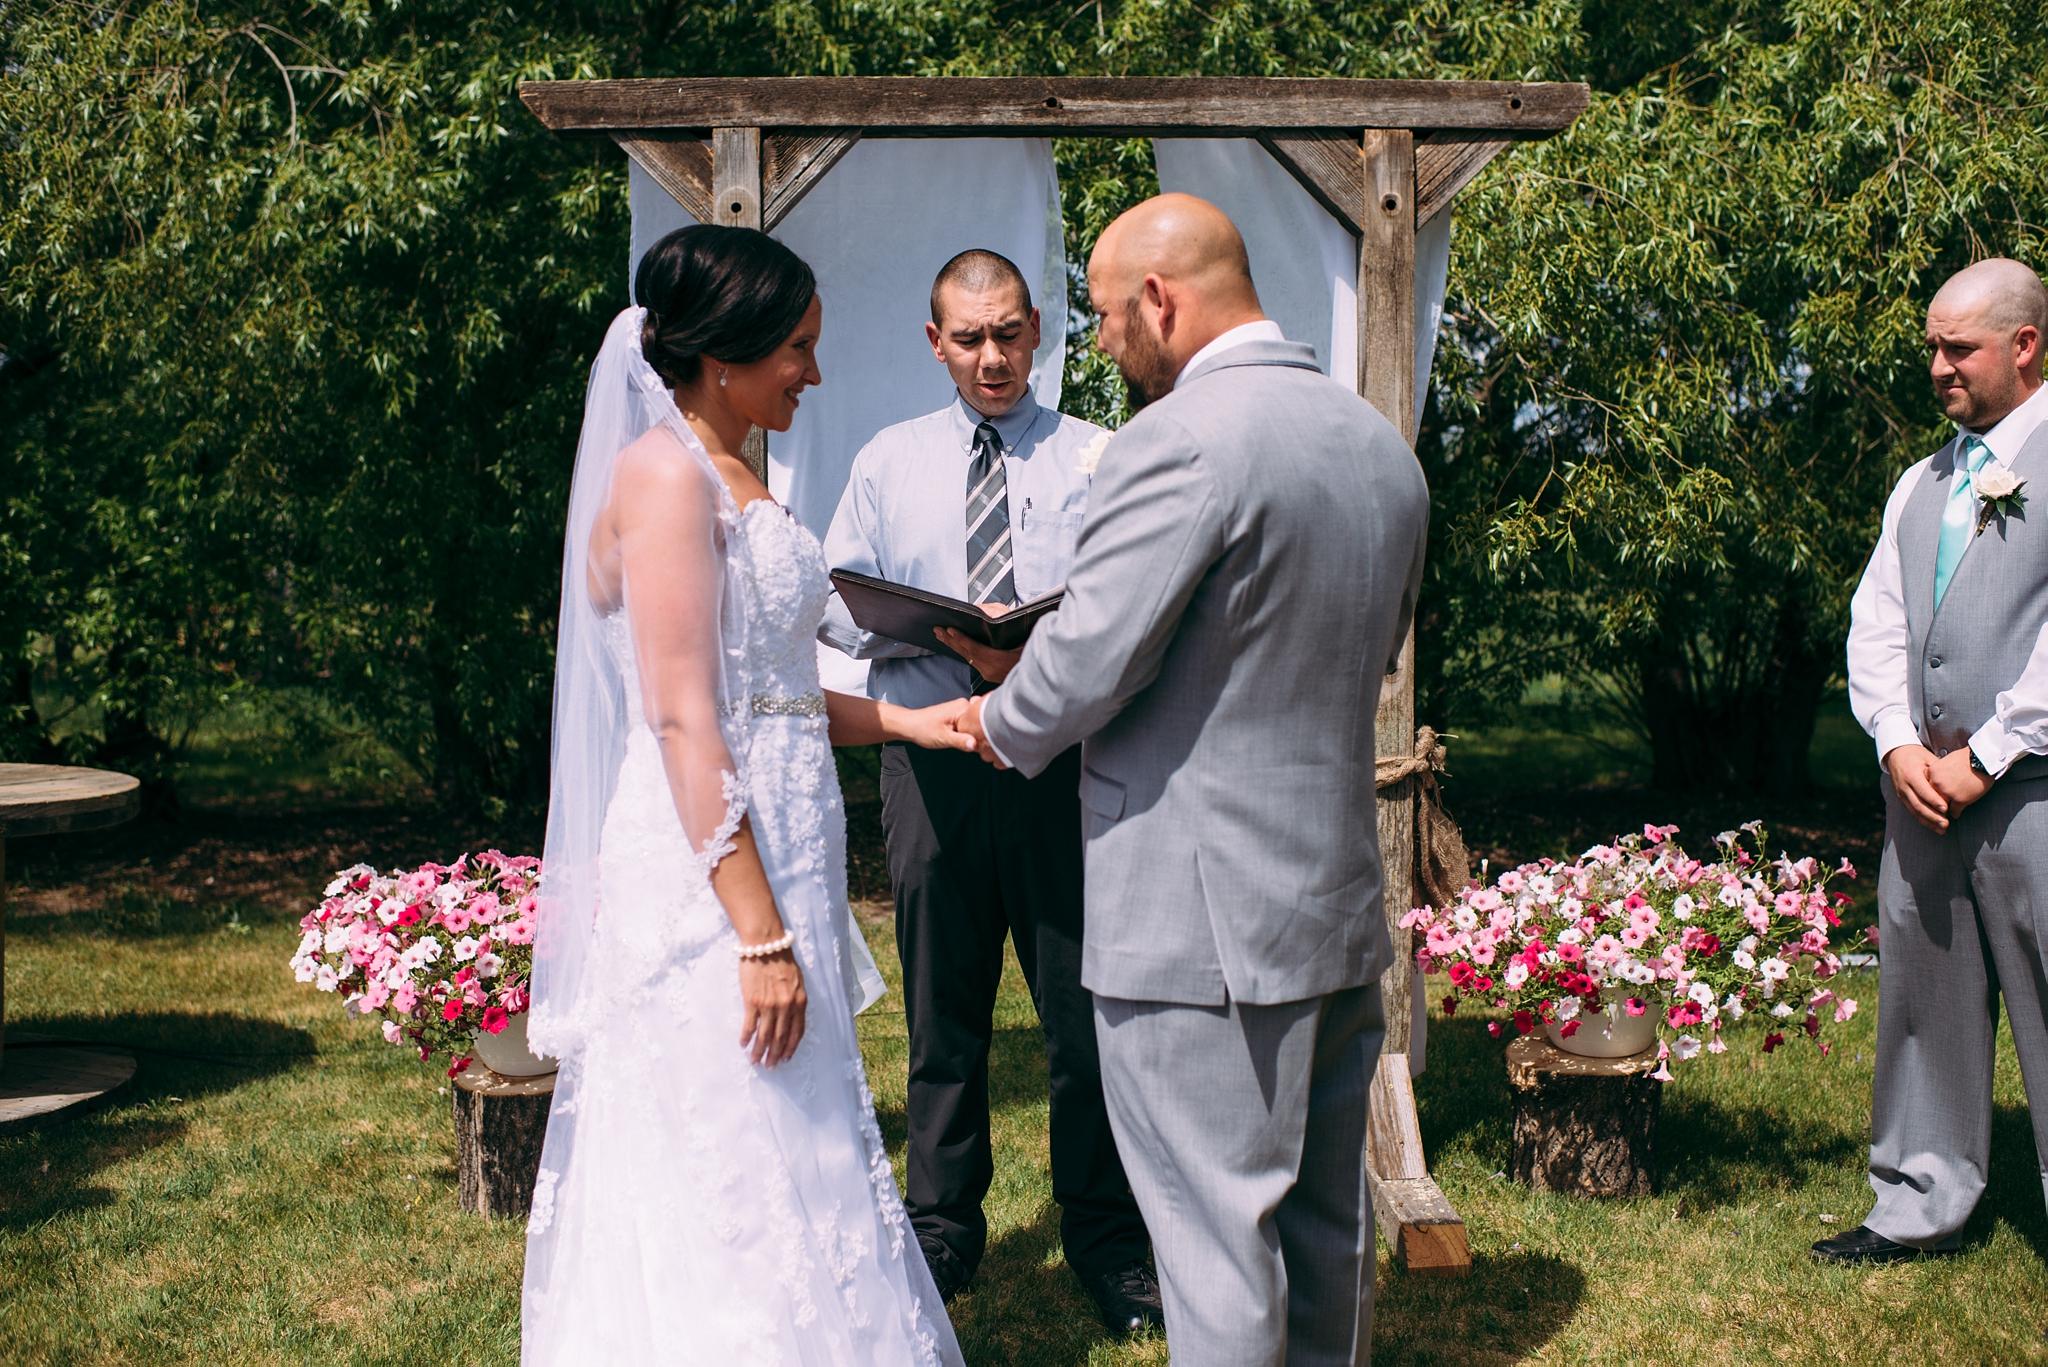 kaihla_tonai_intimate_wedding_elopement_photographer_1524